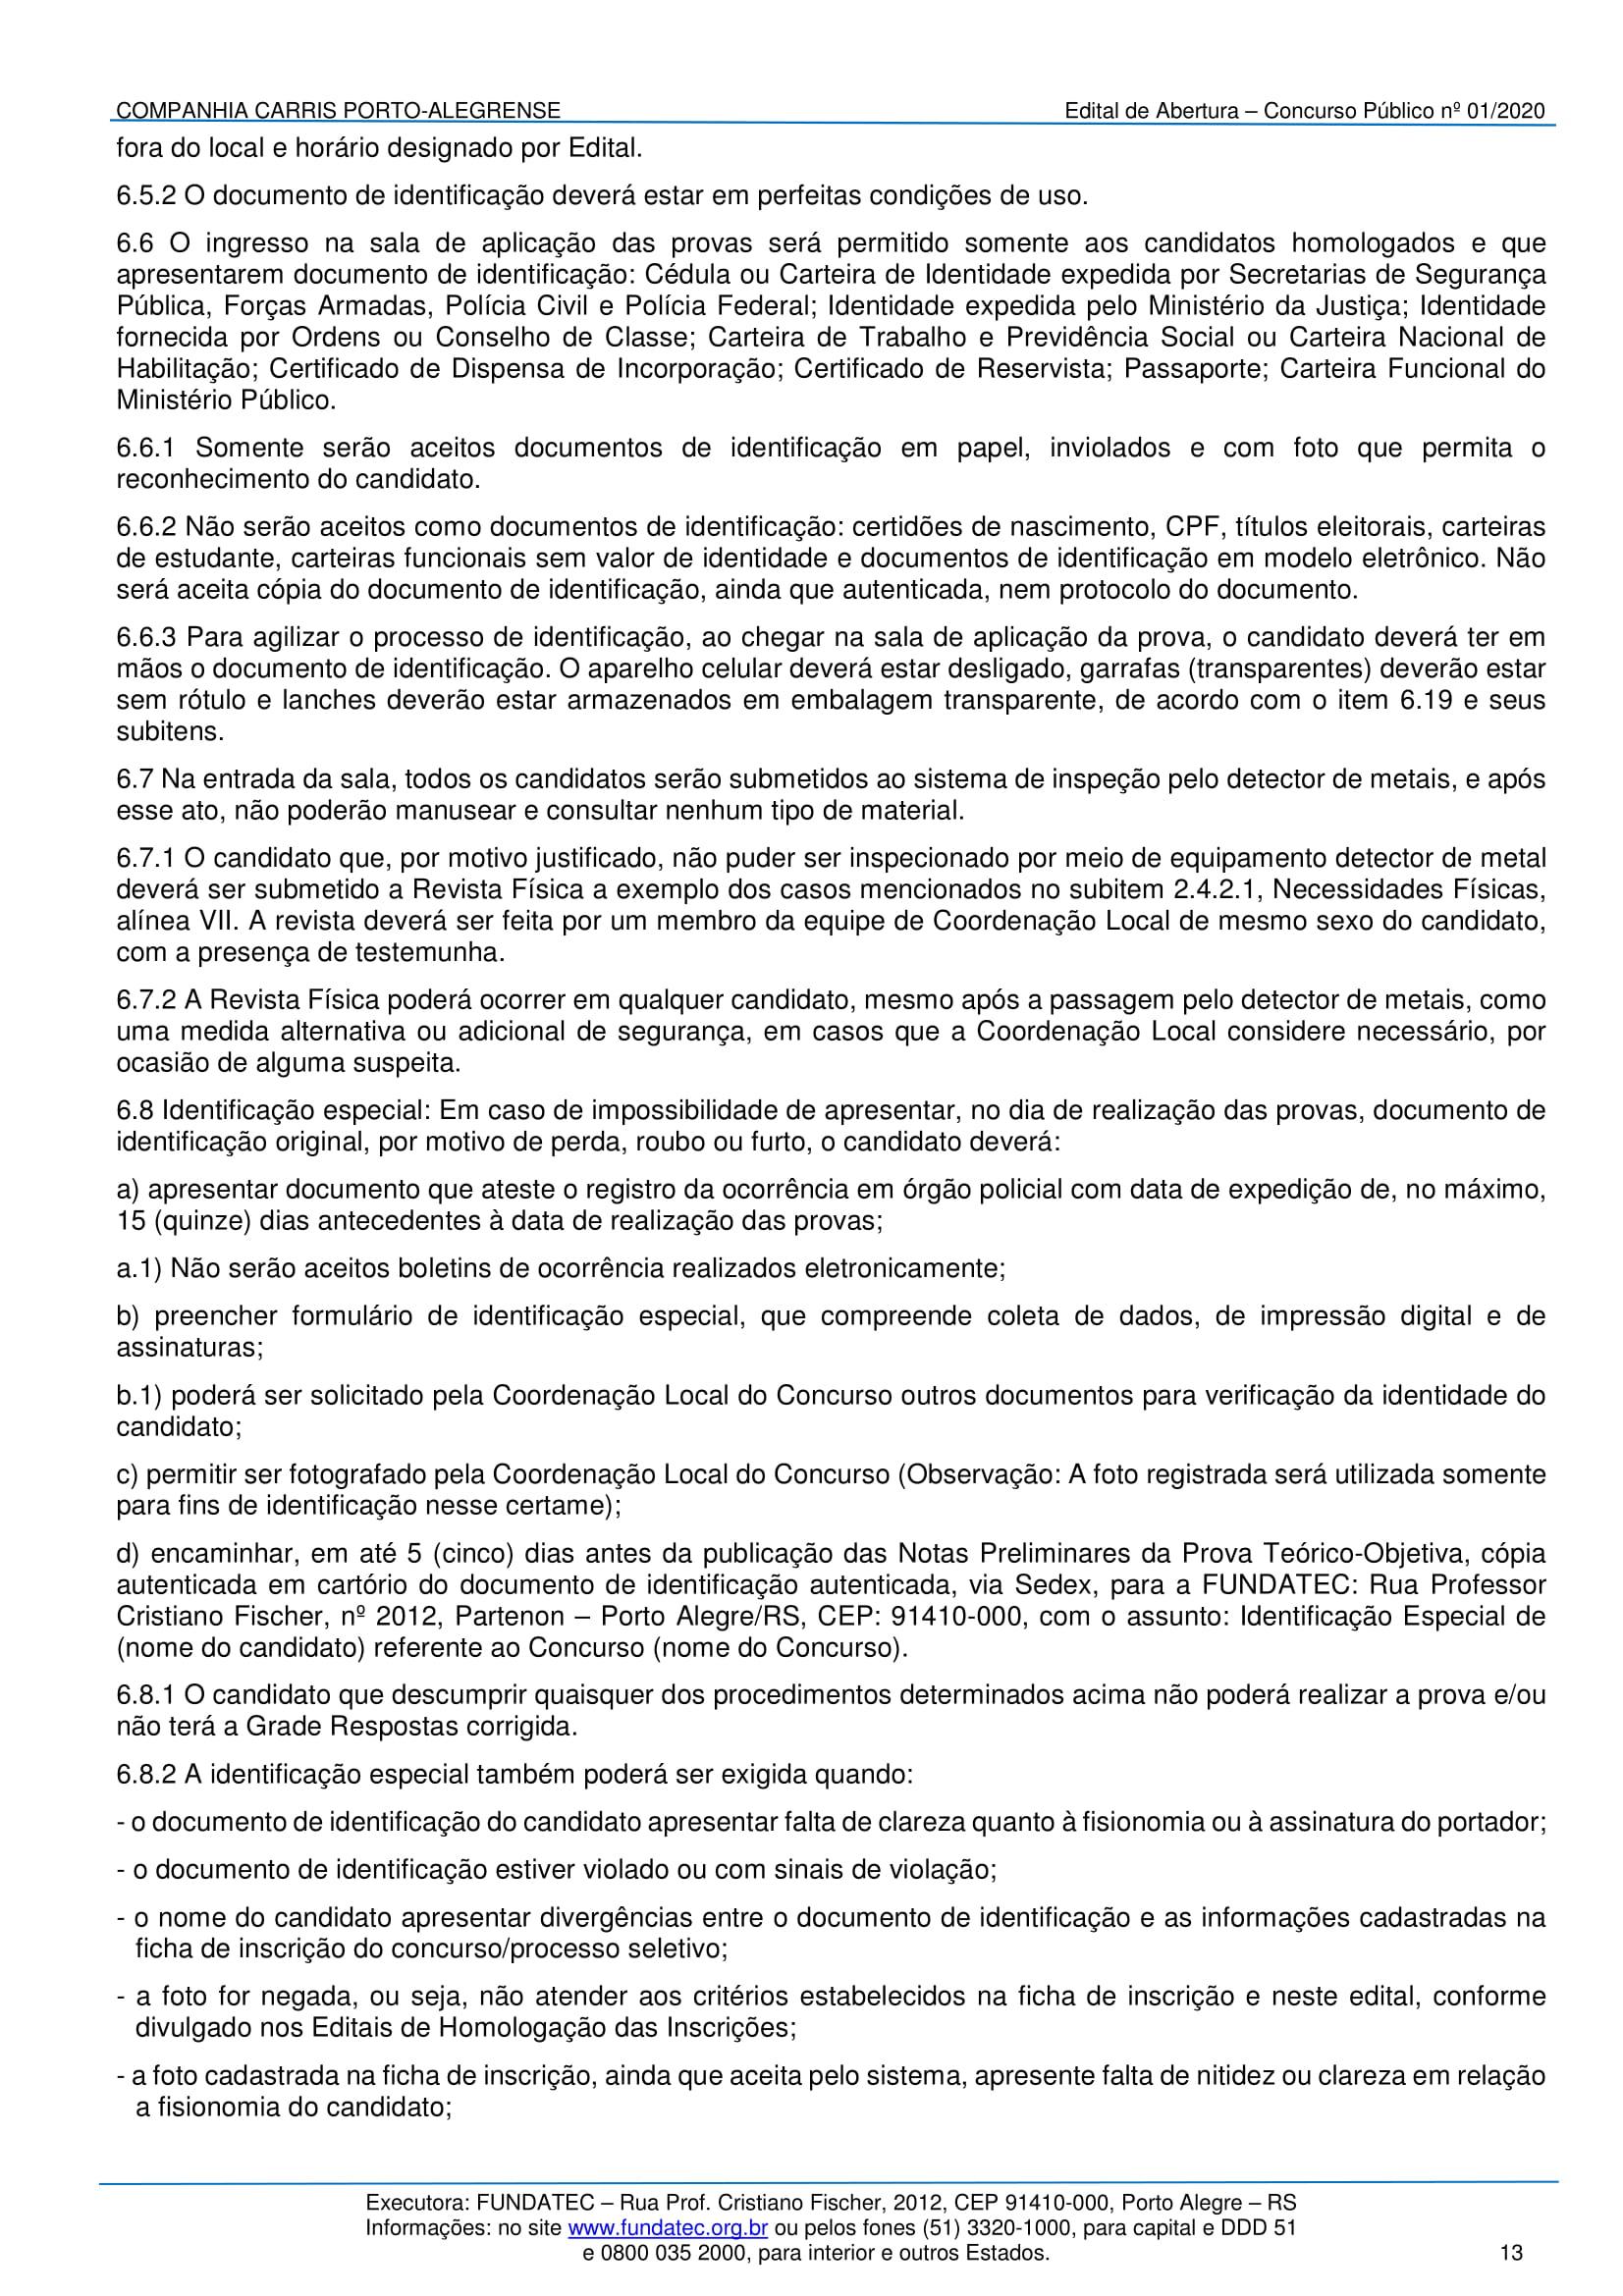 auditor-13